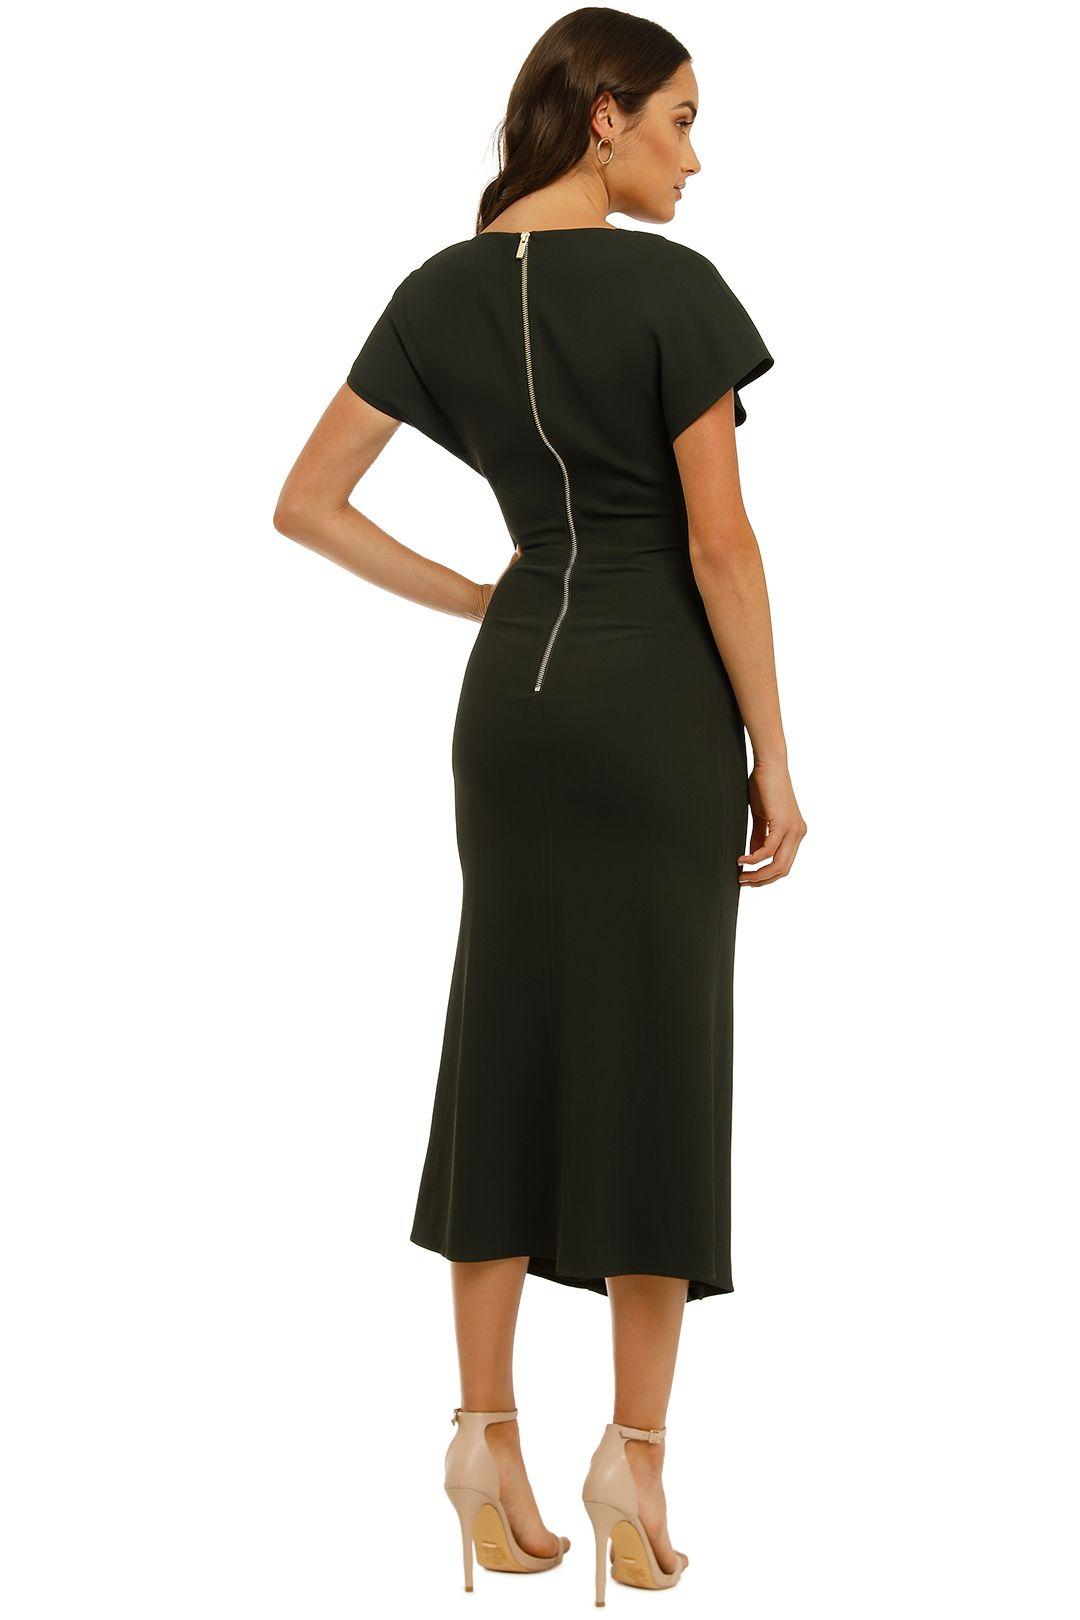 Ginger-and-Smart-Amplitude-V-Neck-Dress-Dark Kelp-Back